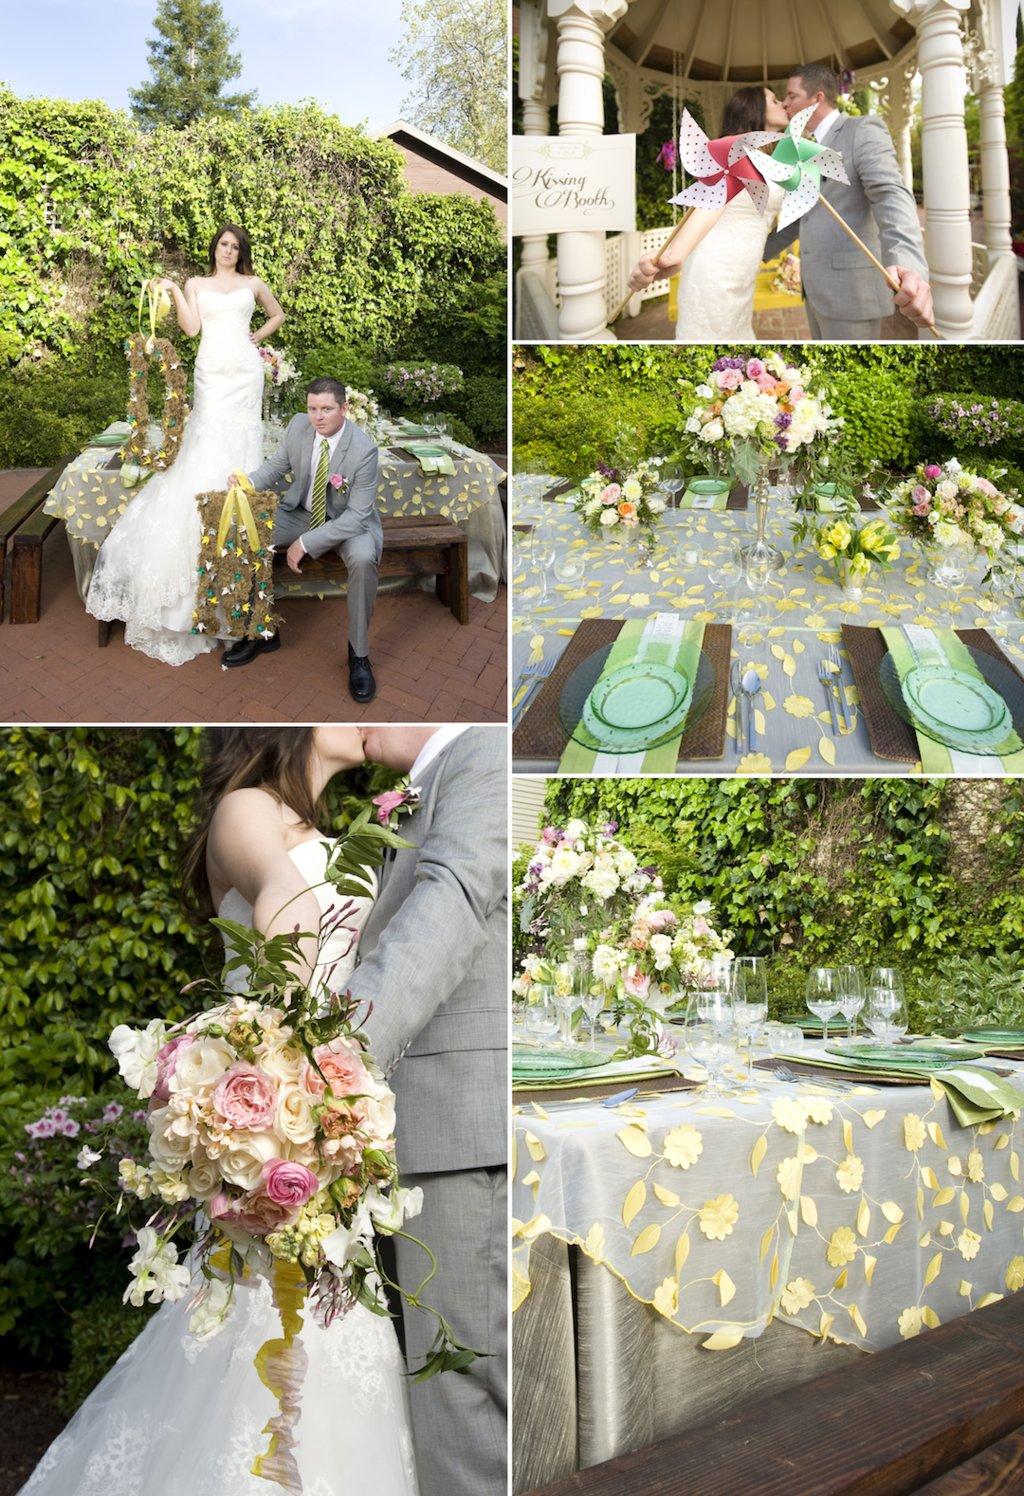 Whimsical-garden-wedding-green-yellow-romantic-flowers-bride-groom-kissing-booth.full